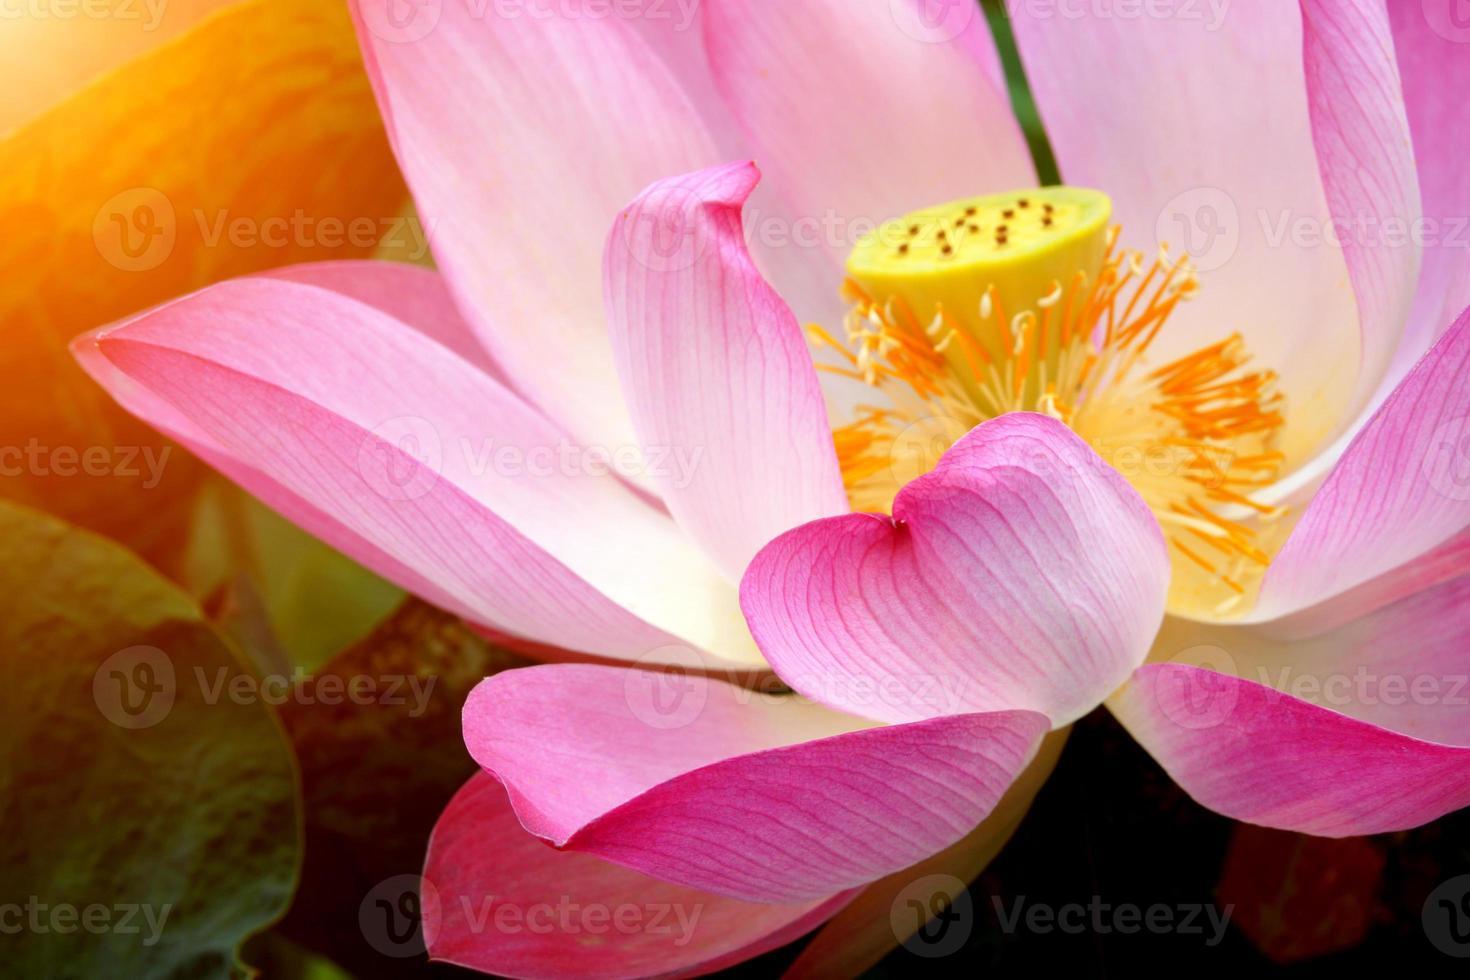 flor de loto rosa en flor foto